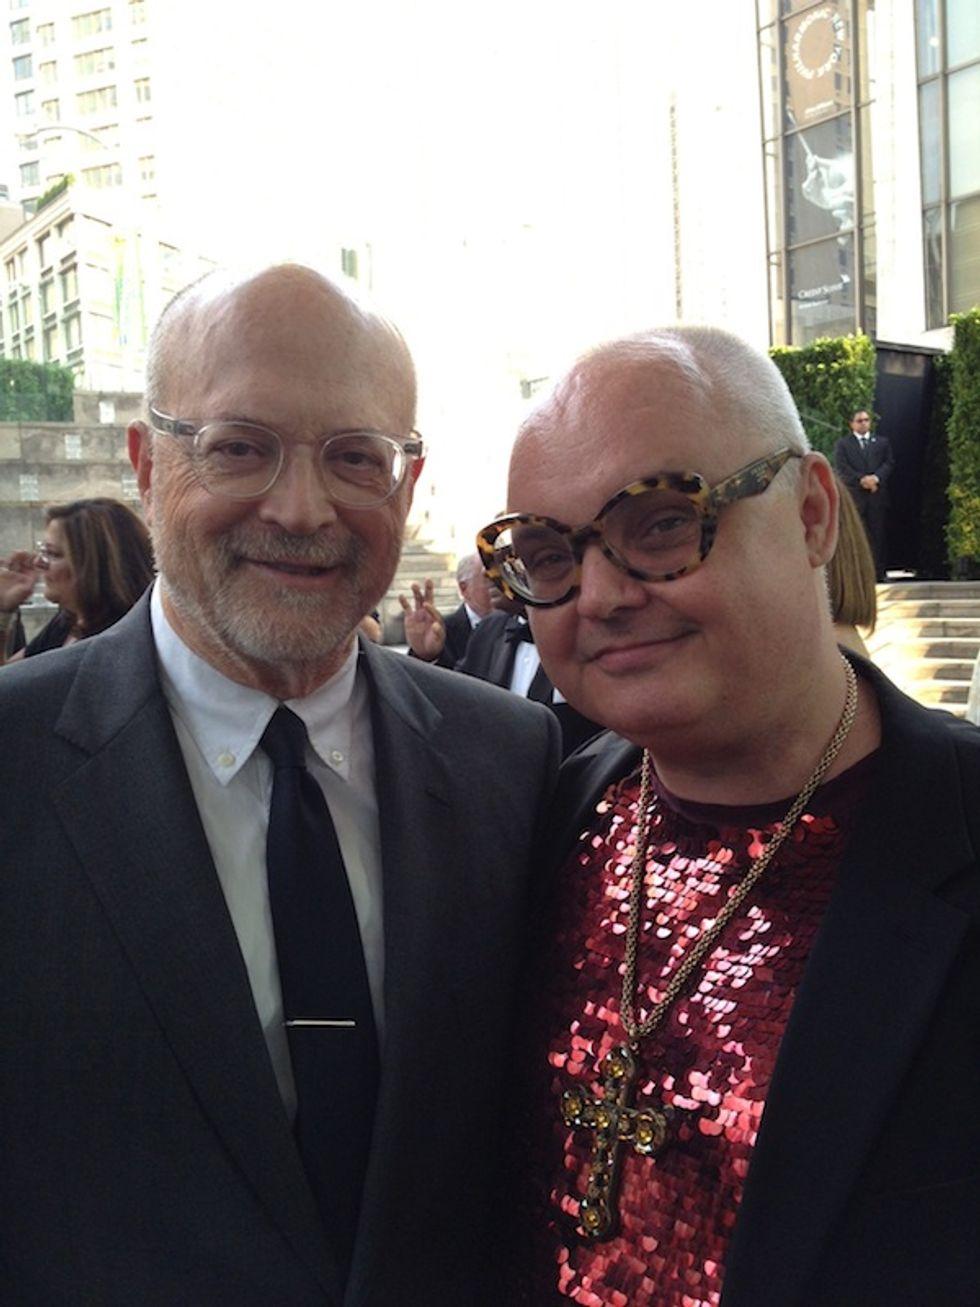 Mr. Mickey's CFDA Awards Photo Album